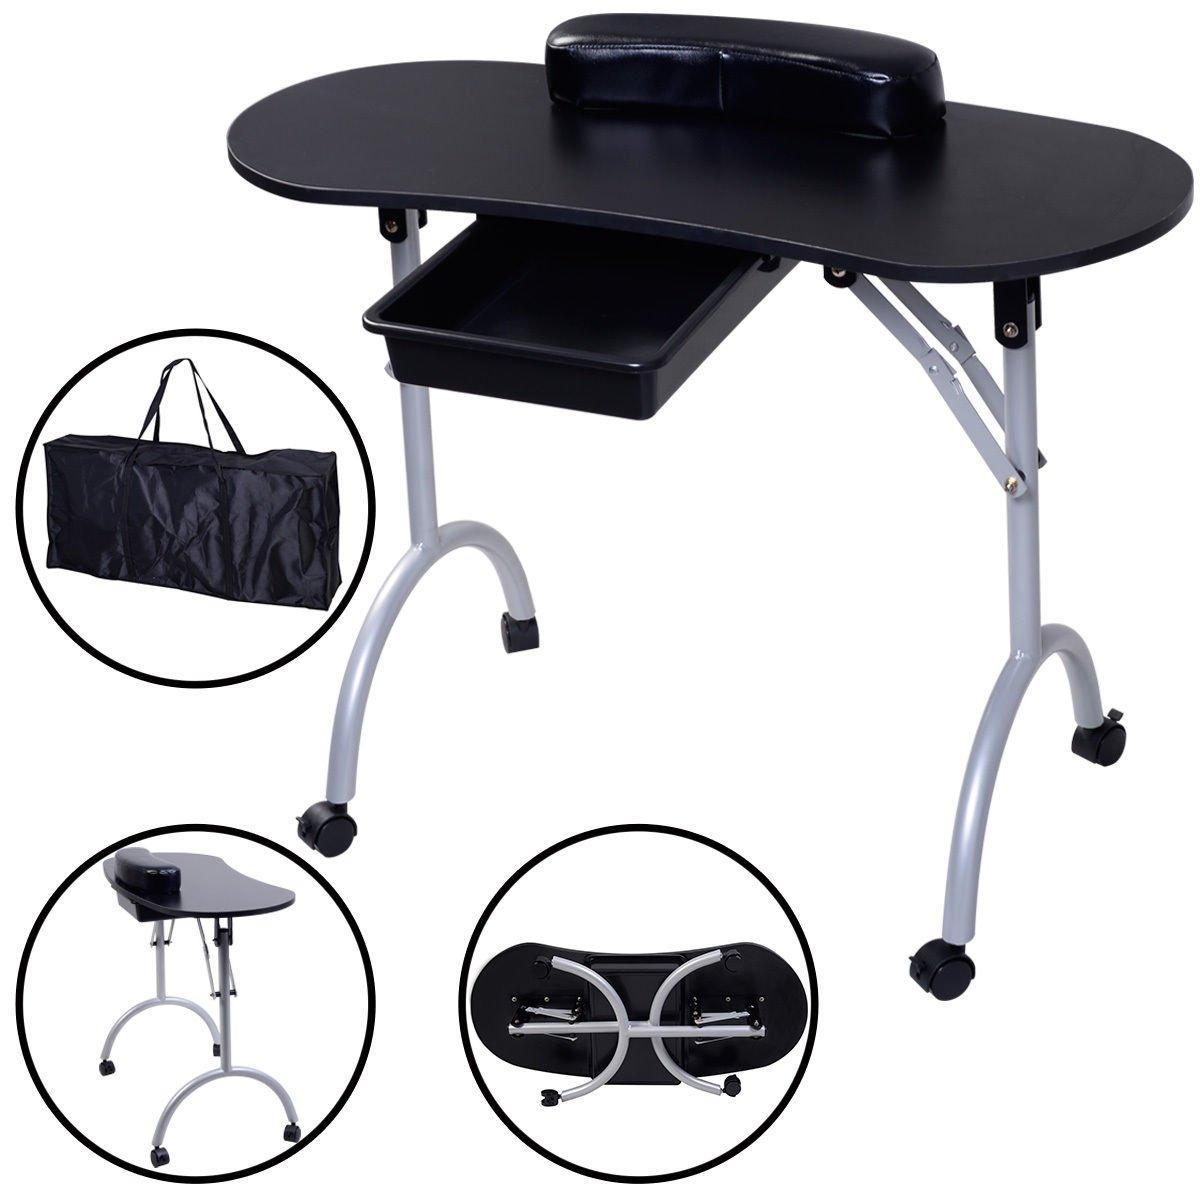 Amazon.com : Giantex Portable Manicure Nail Table Station Desk Spa ...